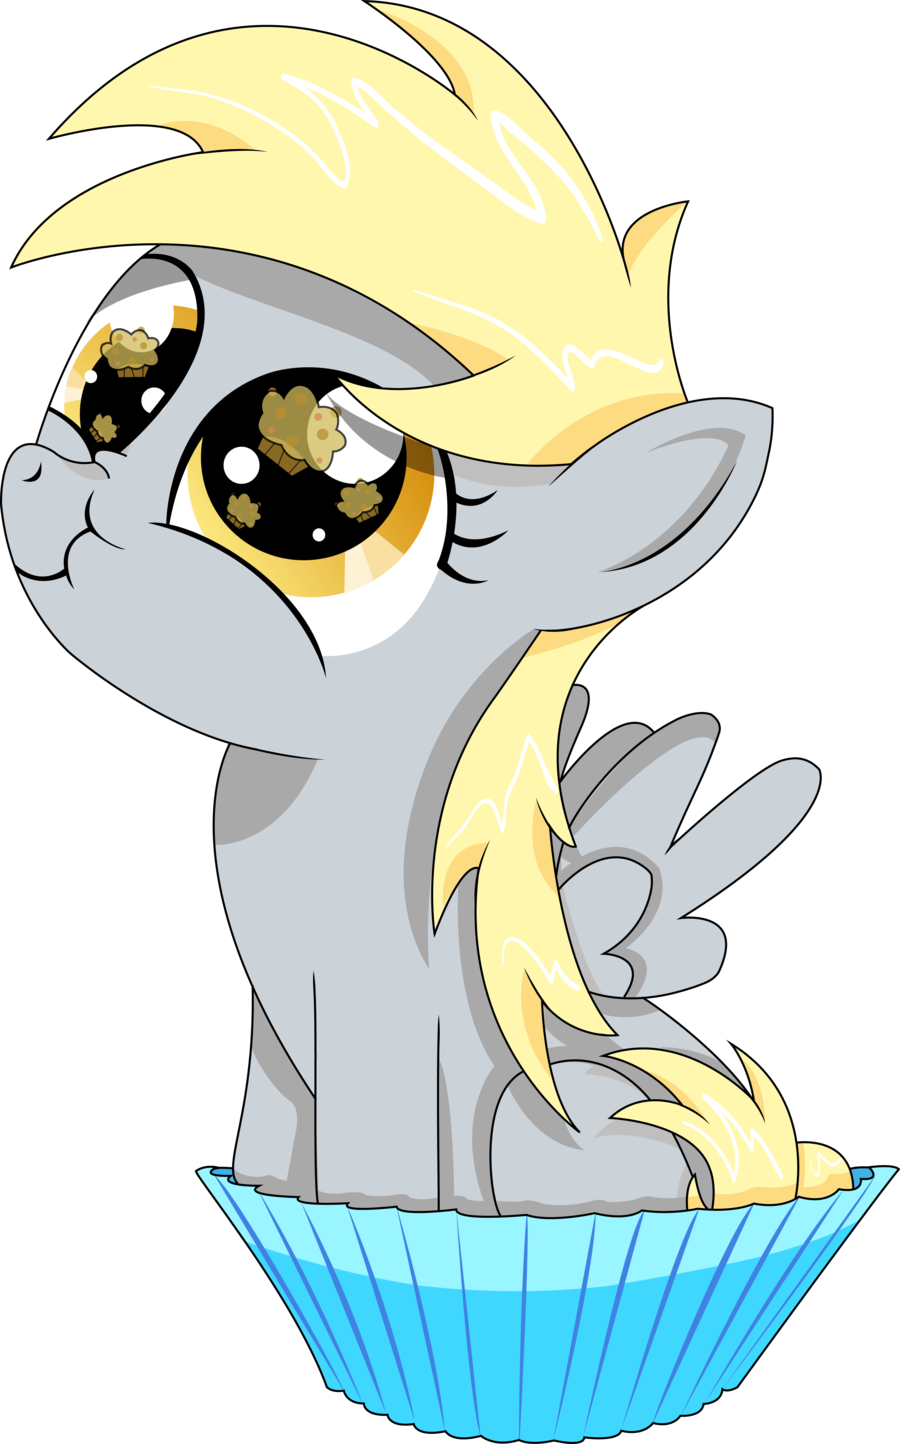 Image my little pony. Muffin clipart kawaii